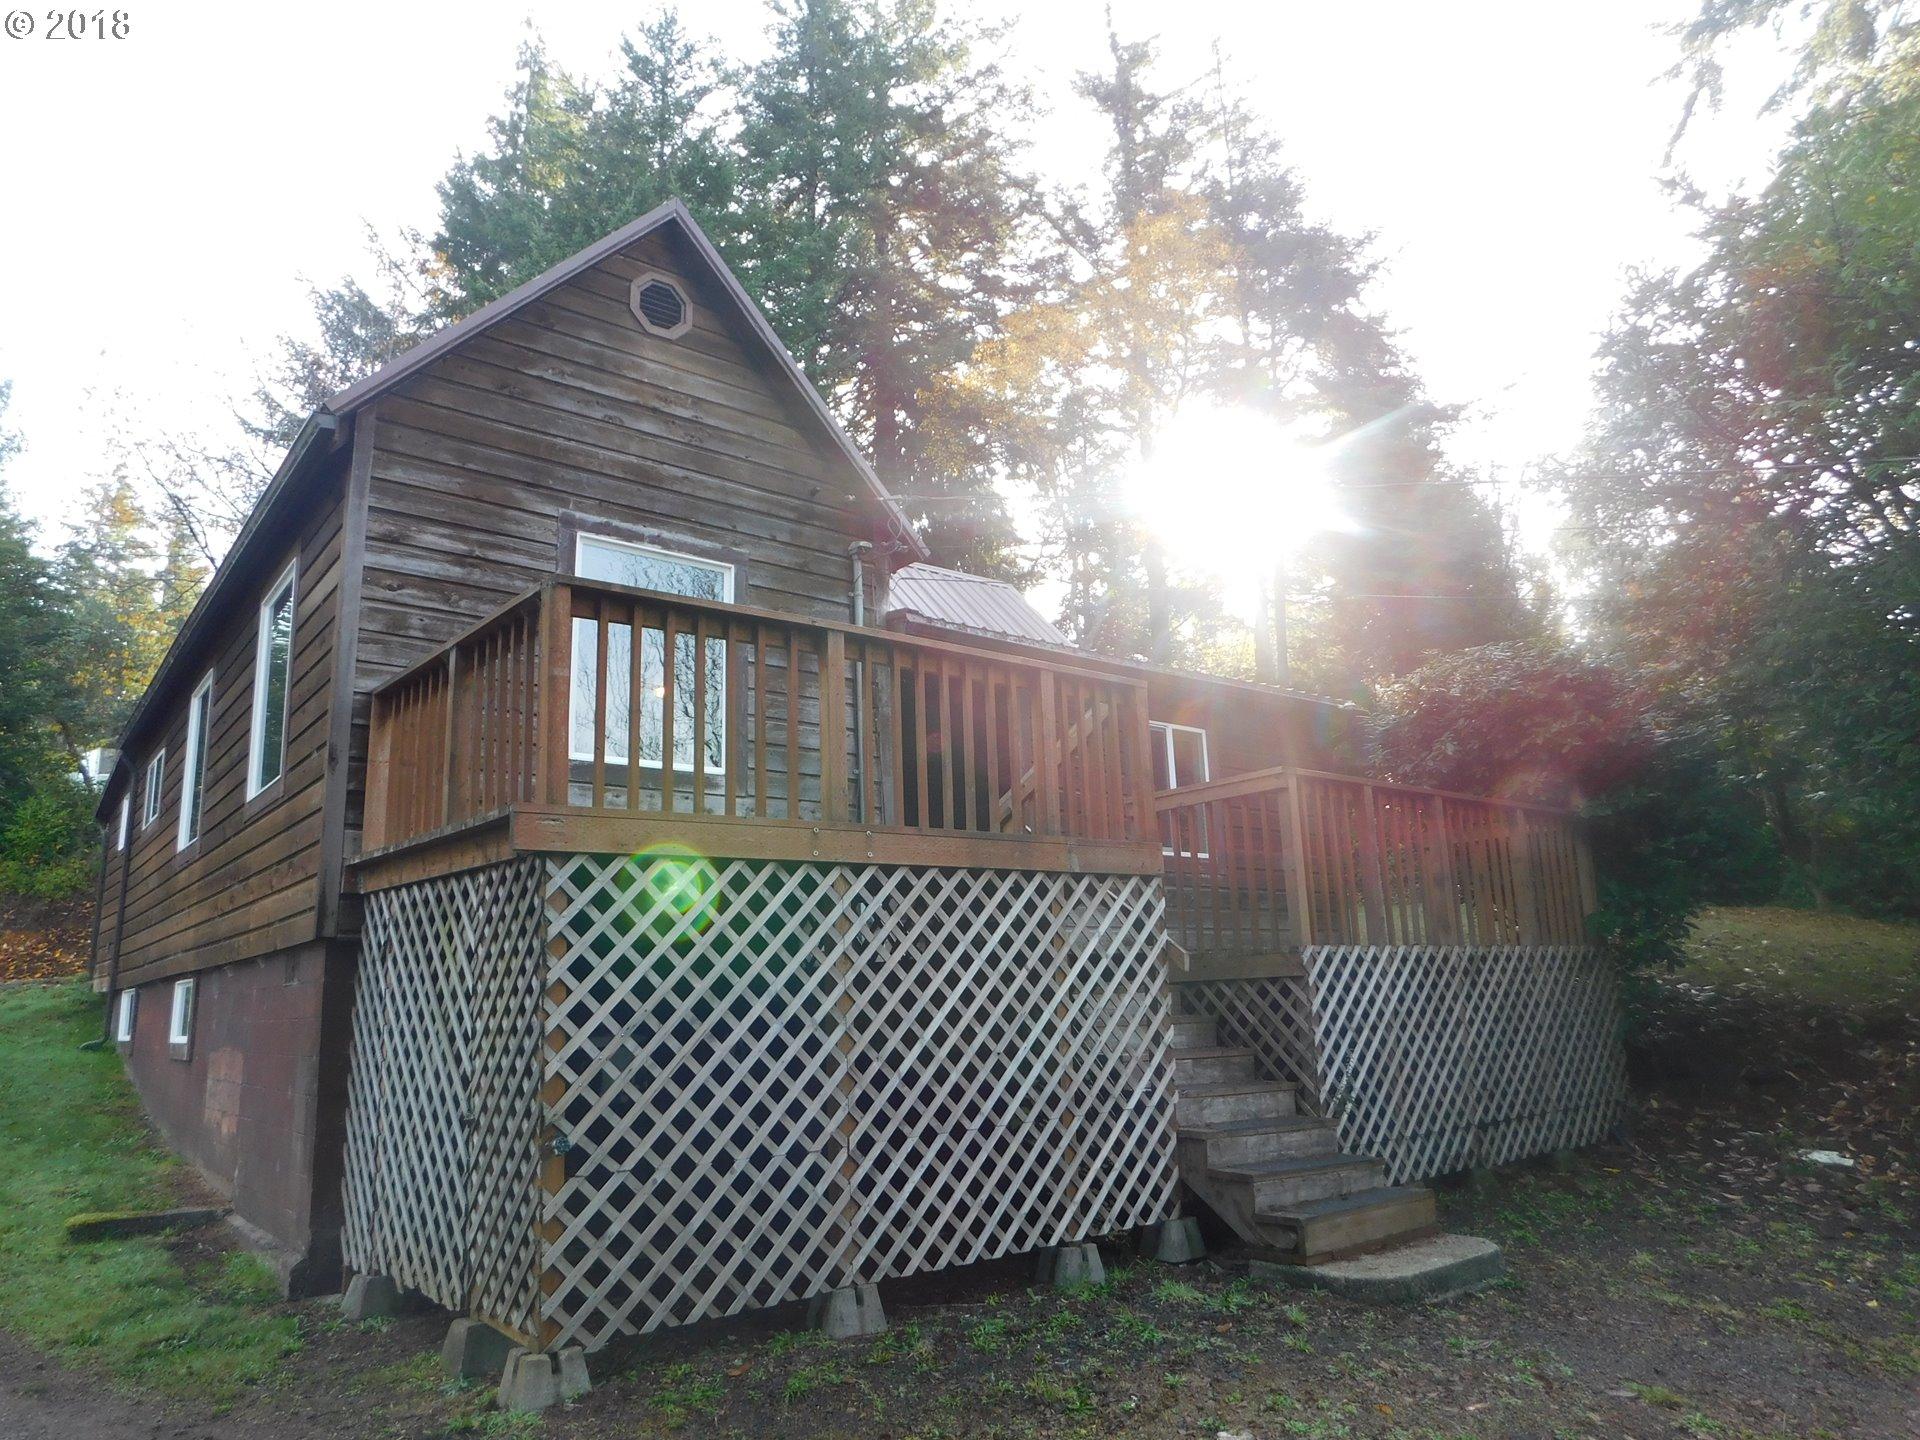 63495 SHINGLEHOUSE RD Coos Bay, OR 97420 - MLS #: 18674551